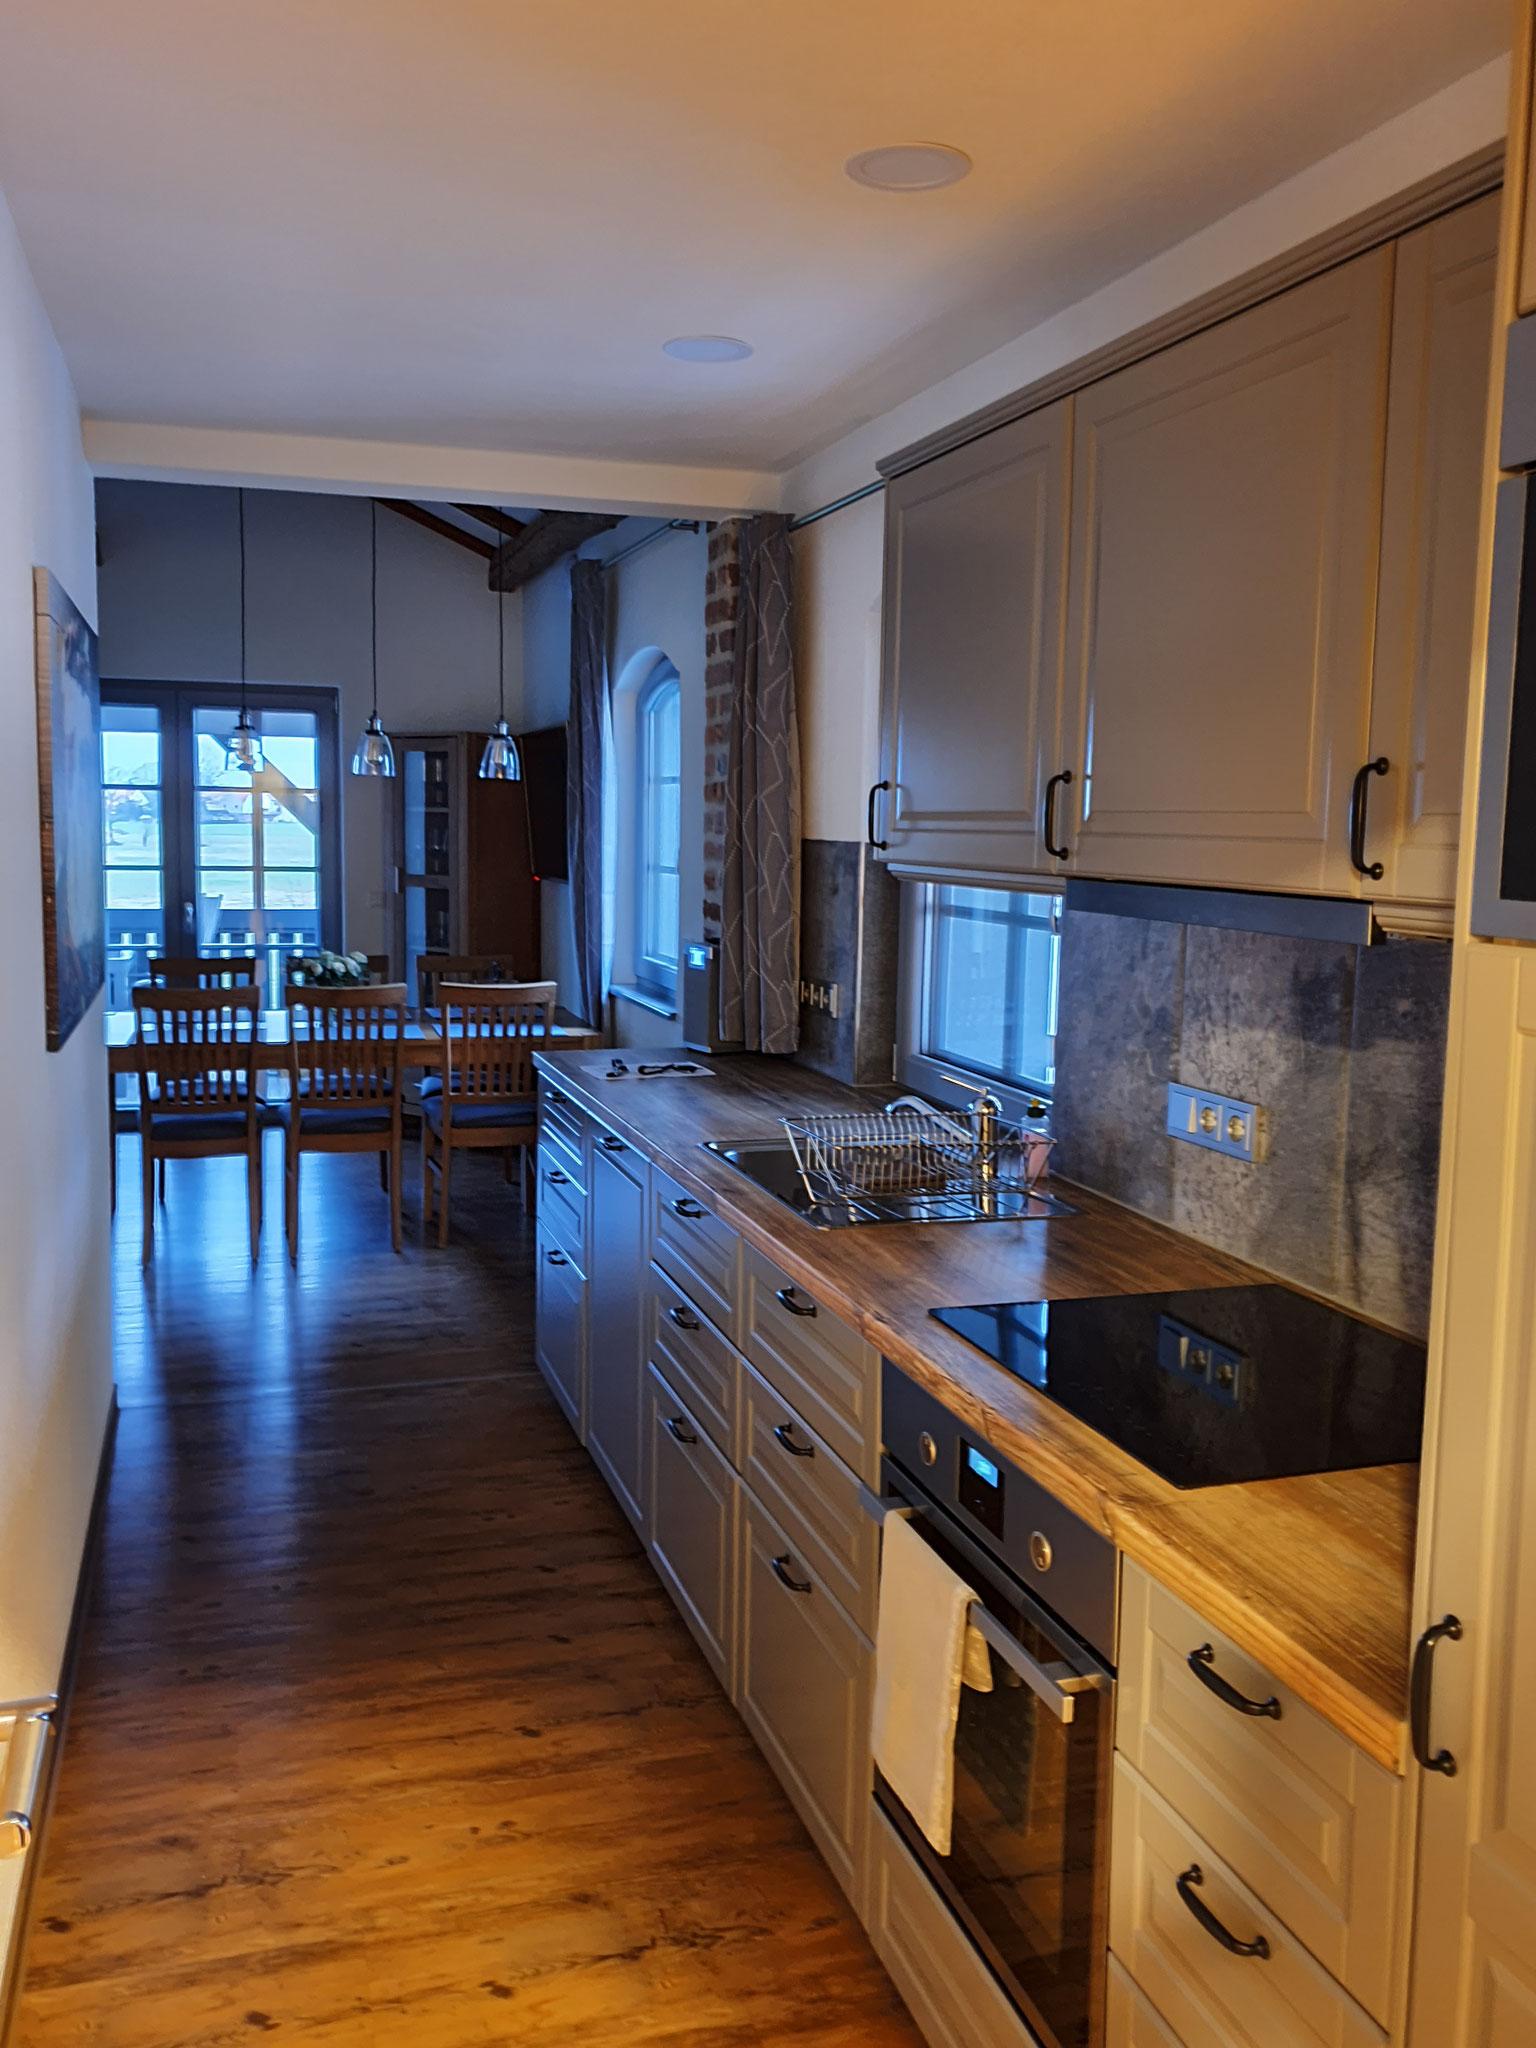 FeWo Landblick Blick in die Küche